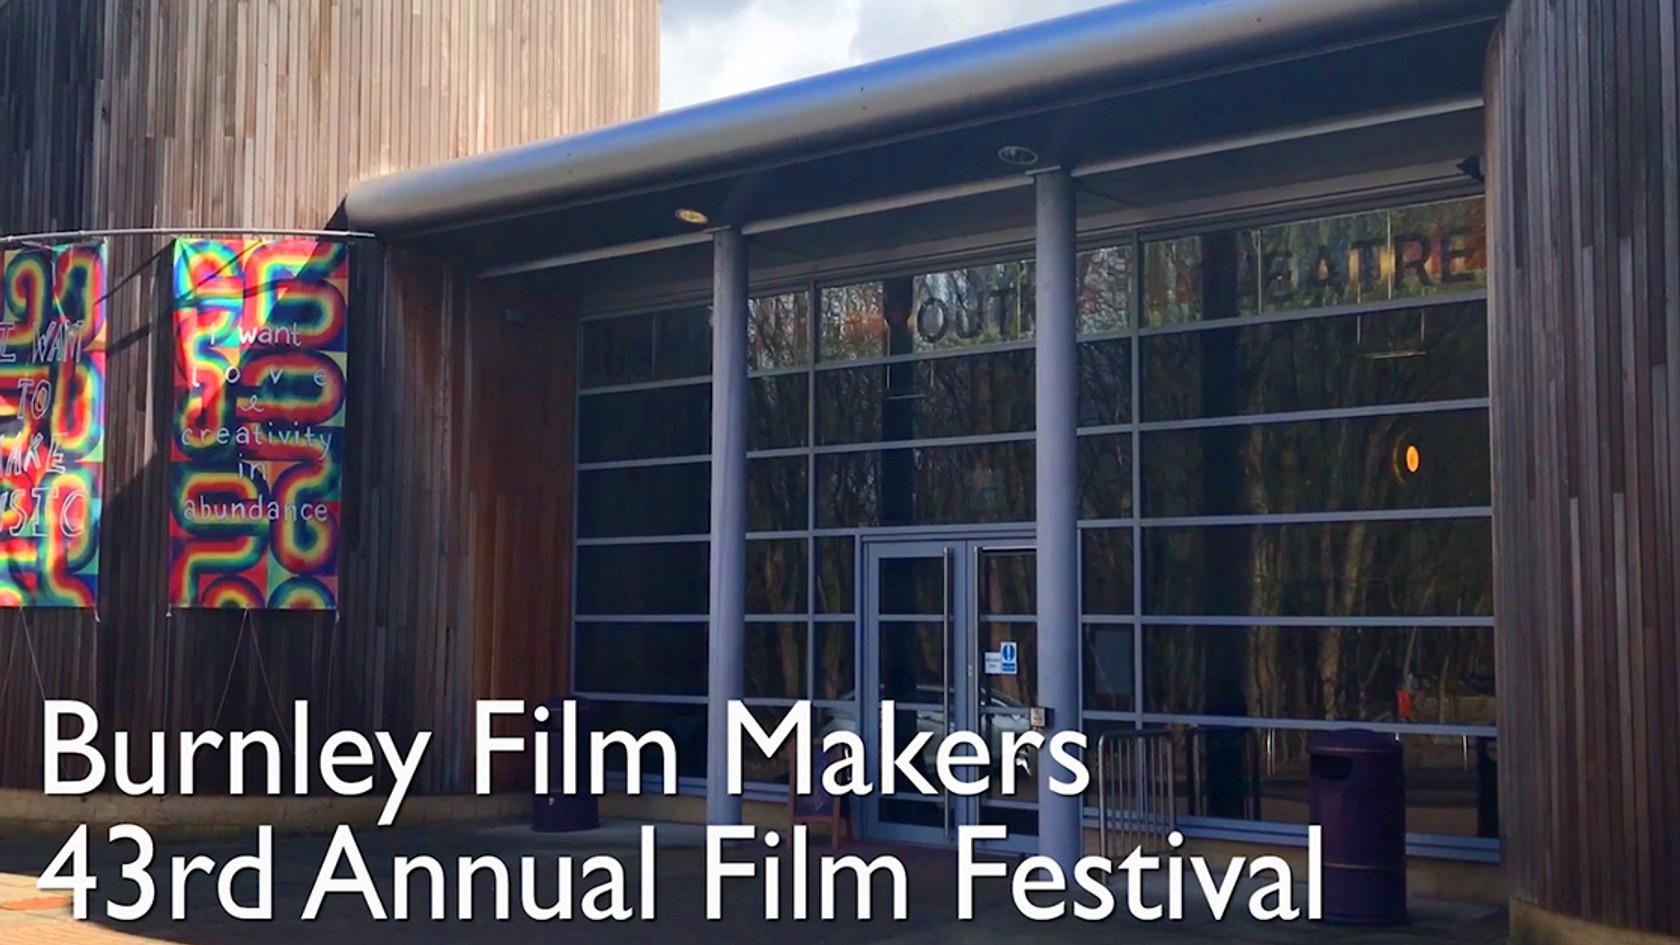 The 43rd Annual Film Festival